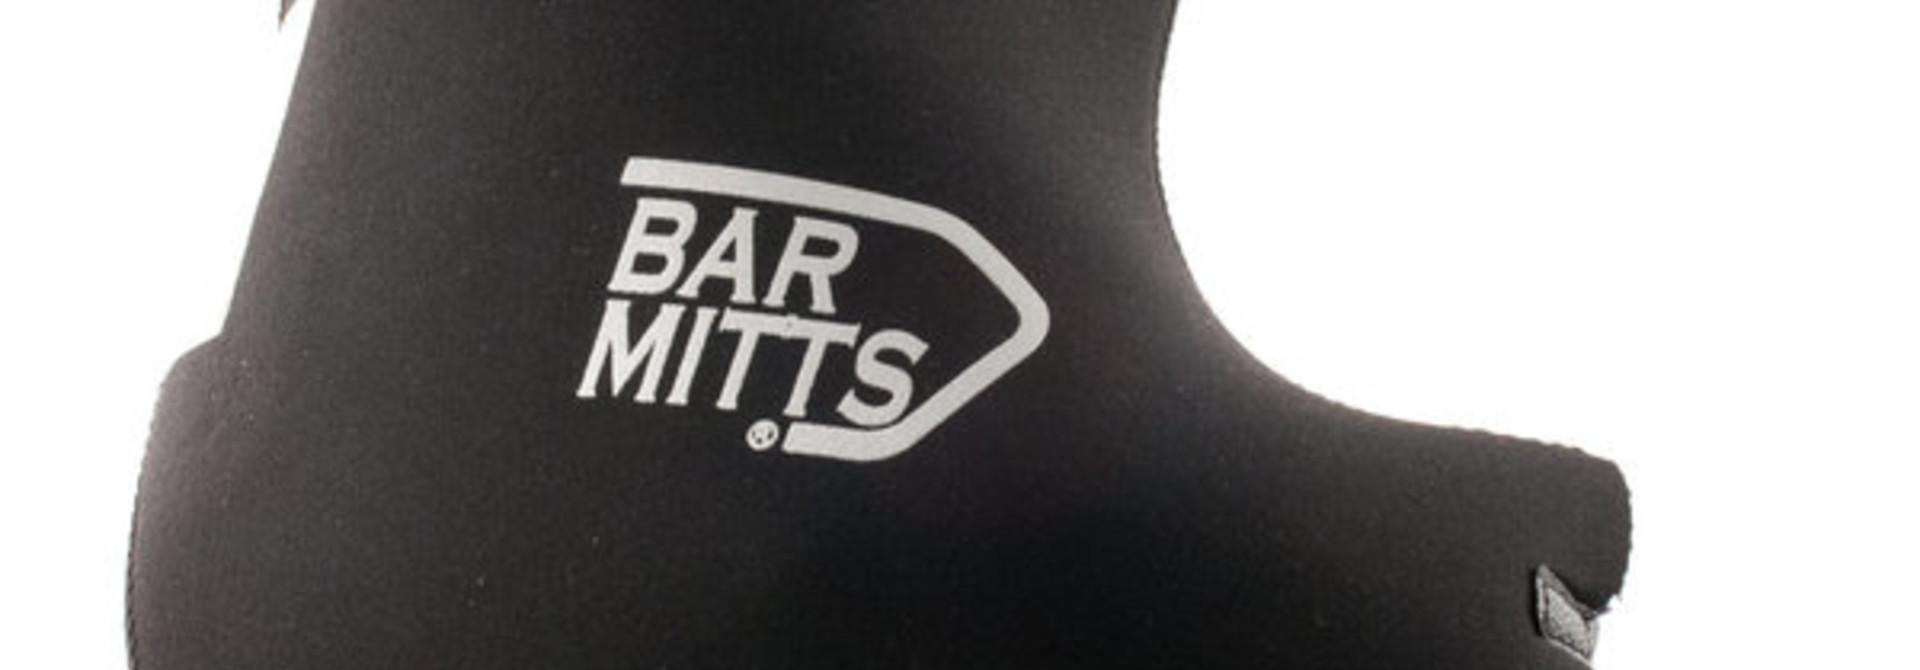 Bar Mitts Mountain/Commuter/Flat Bar - Large